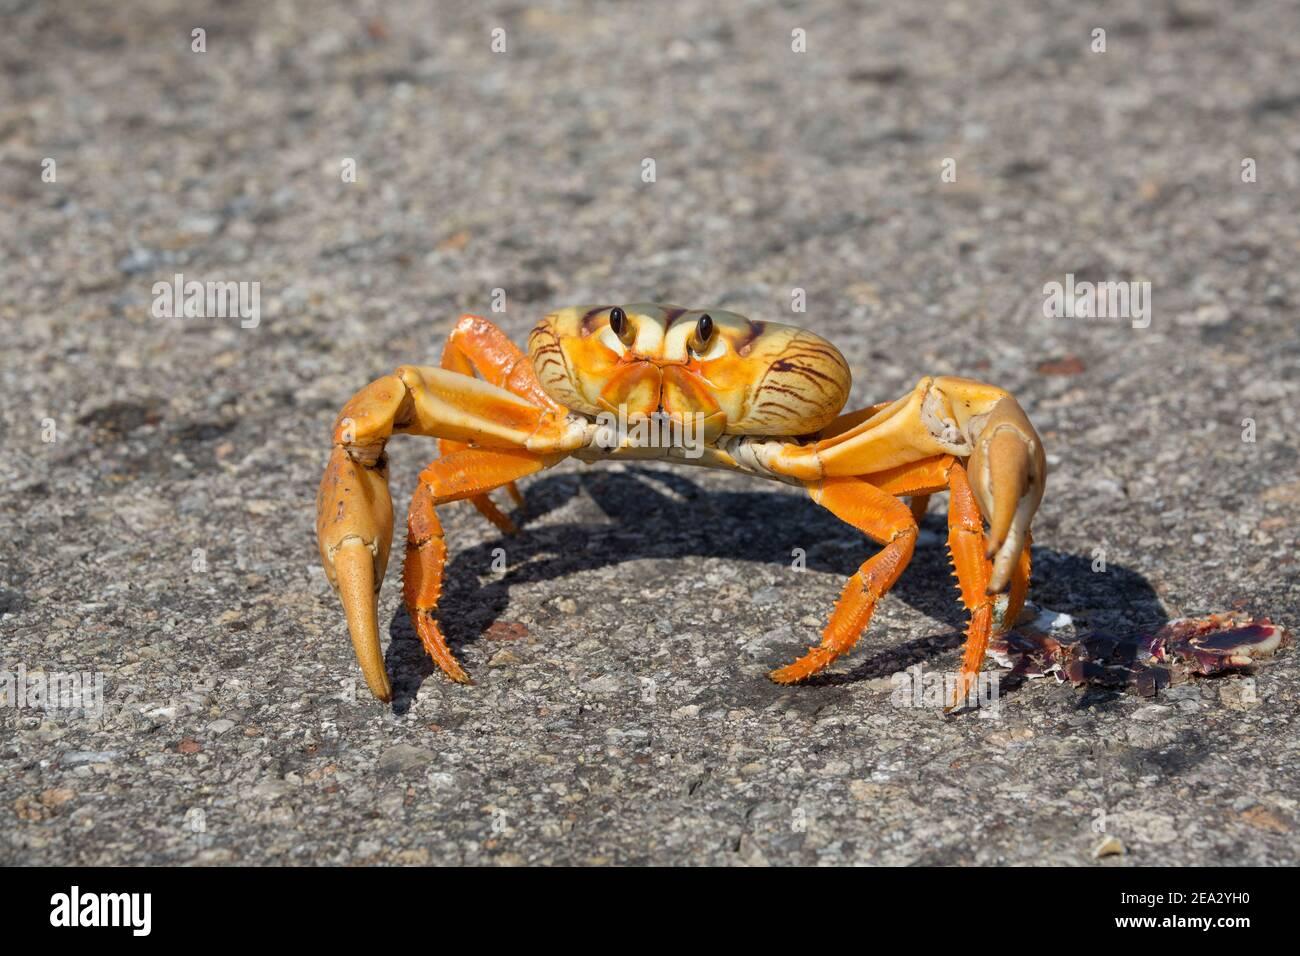 Cuban Land Crab, Gecarcinus ruricola, single orange phase adult on road, March, Playa Giron, Zapata, Cuba Stock Photo